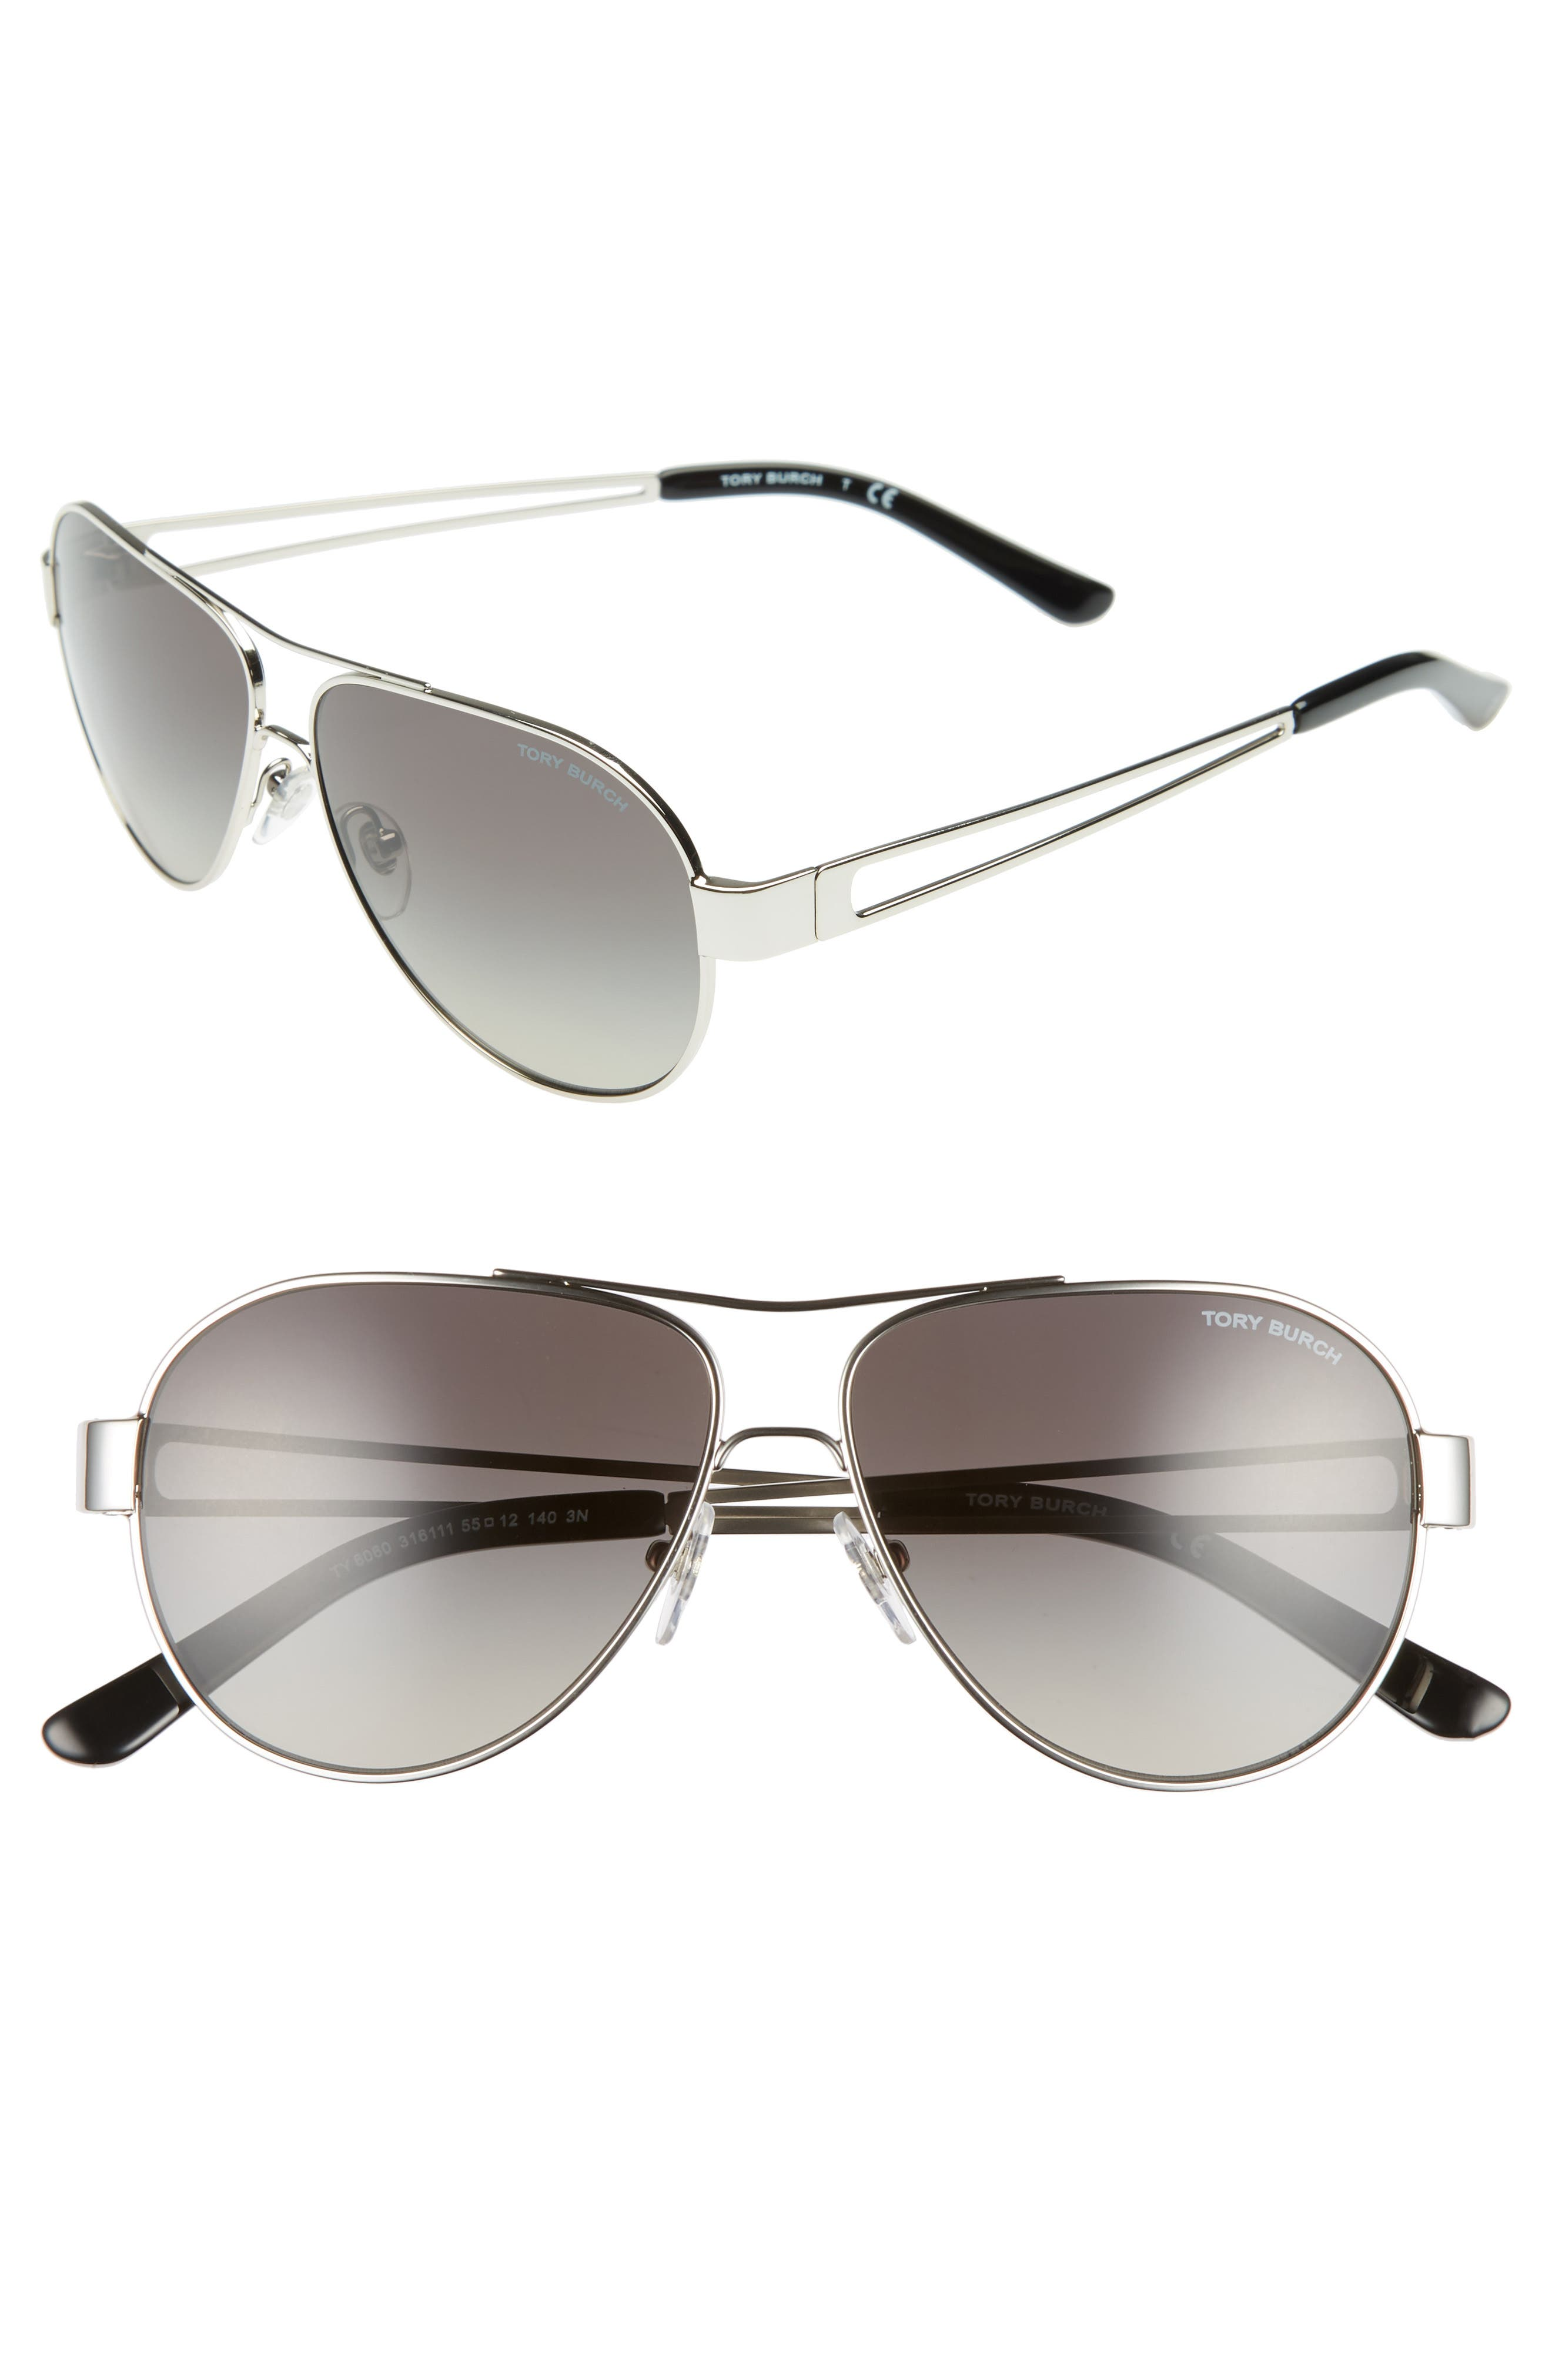 55mm Polarized Aviator Sunglasses,                         Main,                         color, Silver/ Black Gradient